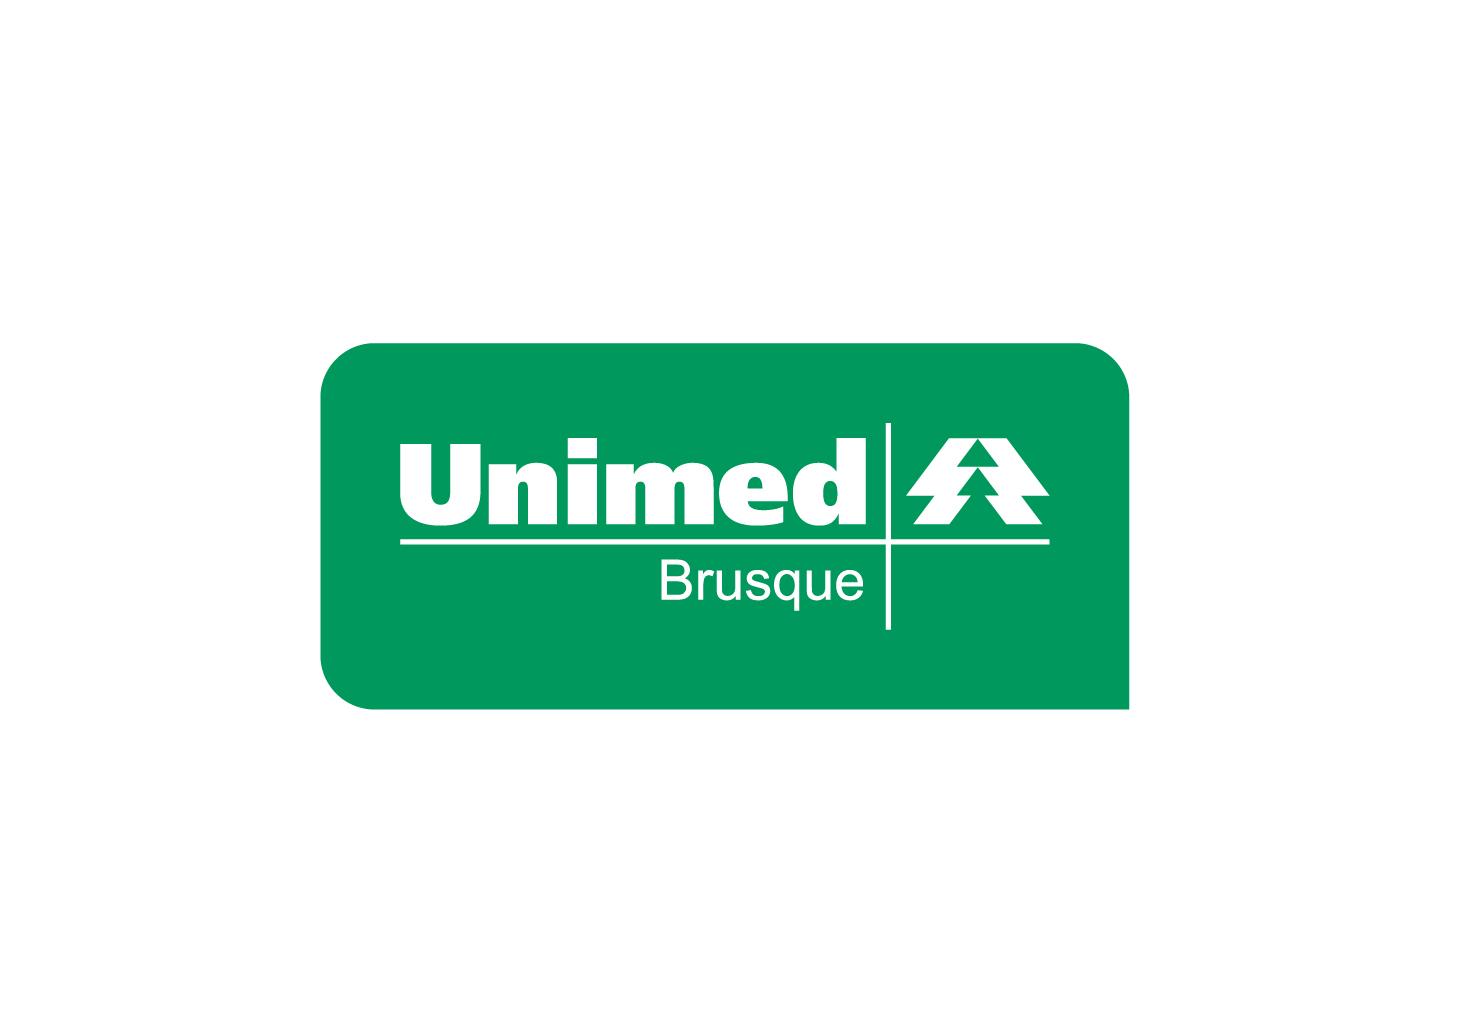 Logotipo AABABA Unimed - Brusque